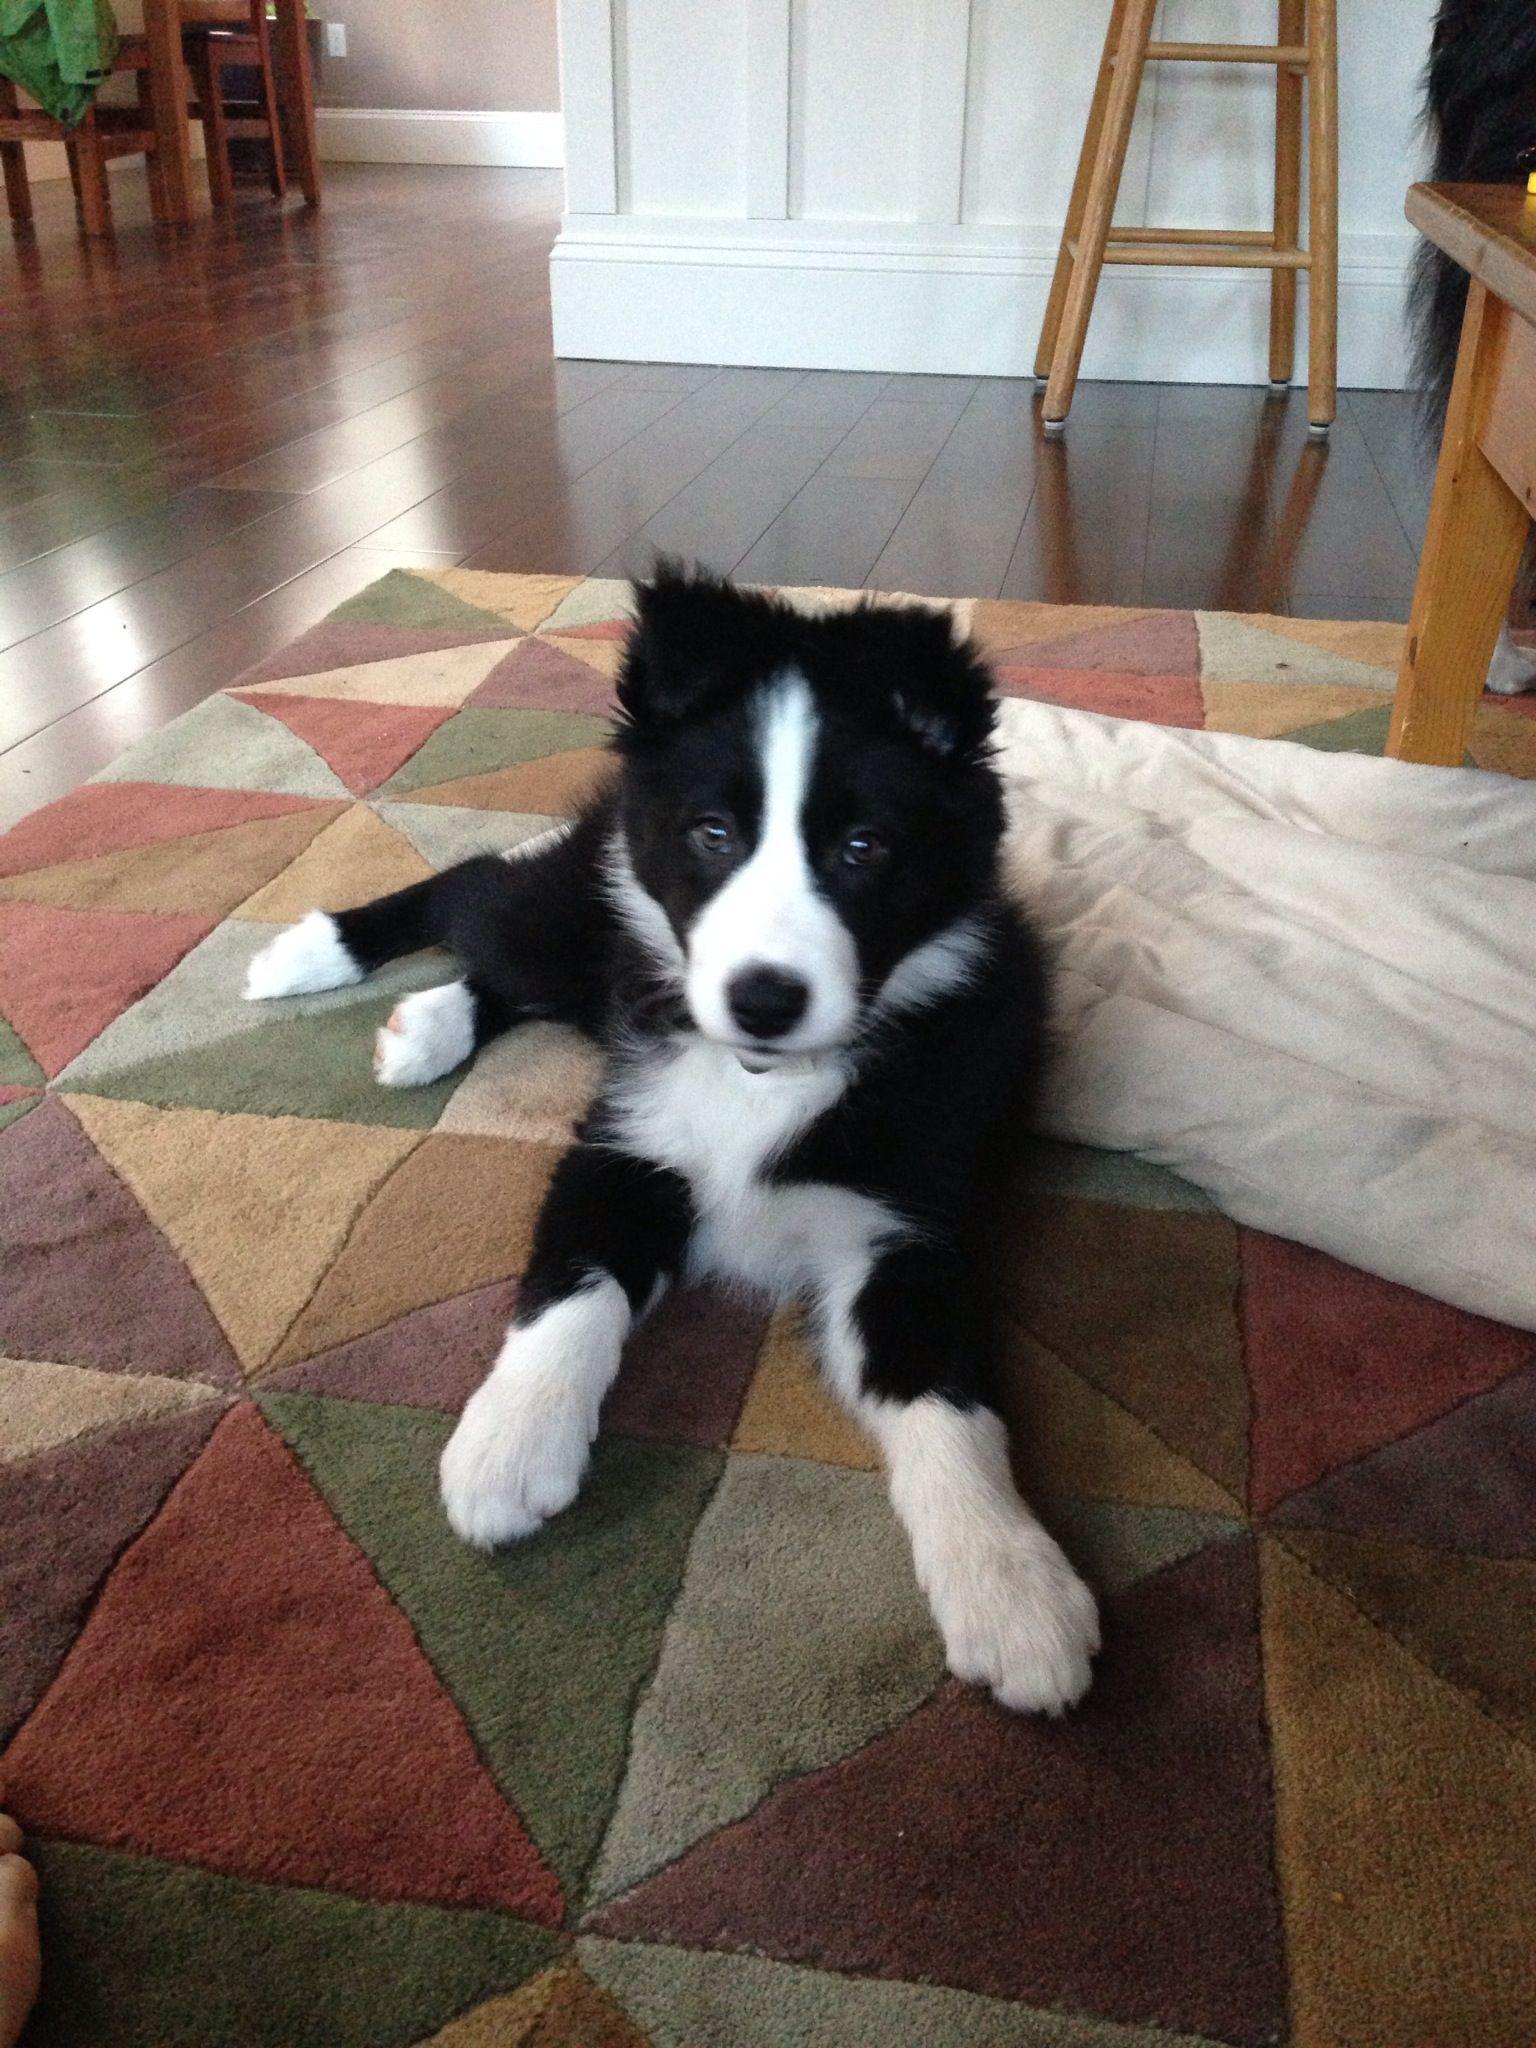 Handsome Devil Border Collie Puppy Love Hob Nob Tekoa Bred By